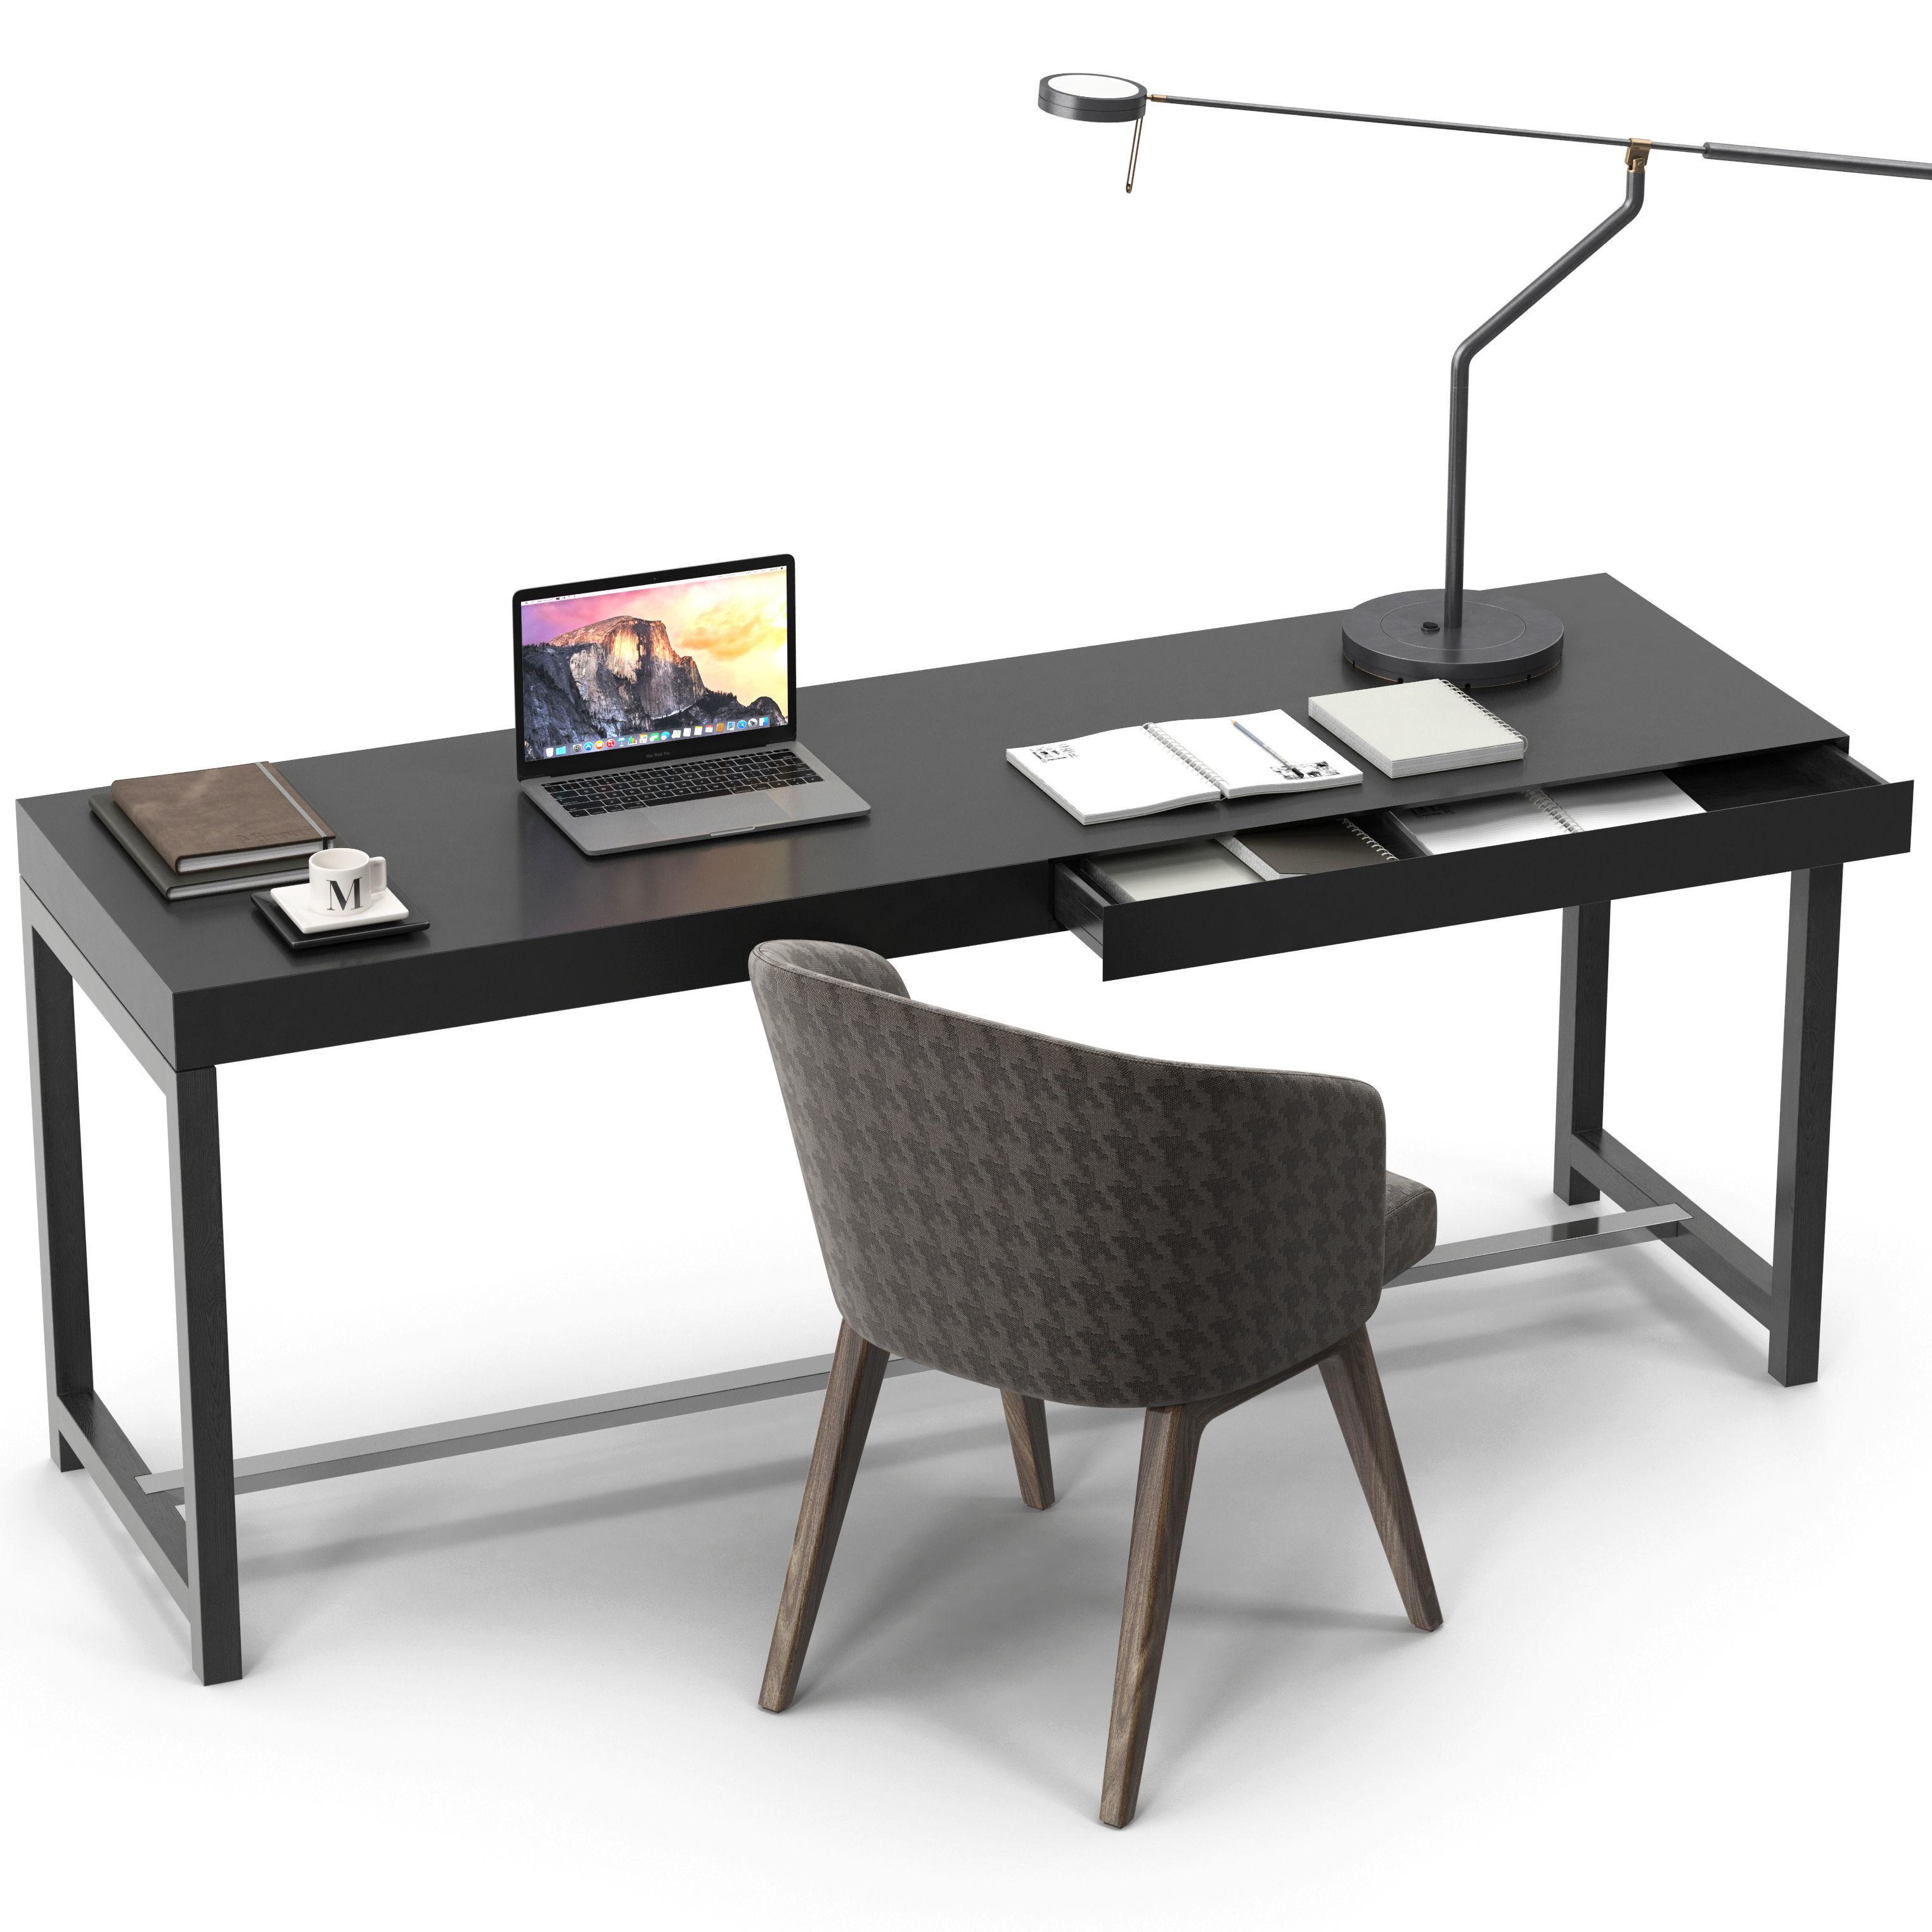 Minotti Fulton Desk Creed Chair Set 3d Model Max Obj 4